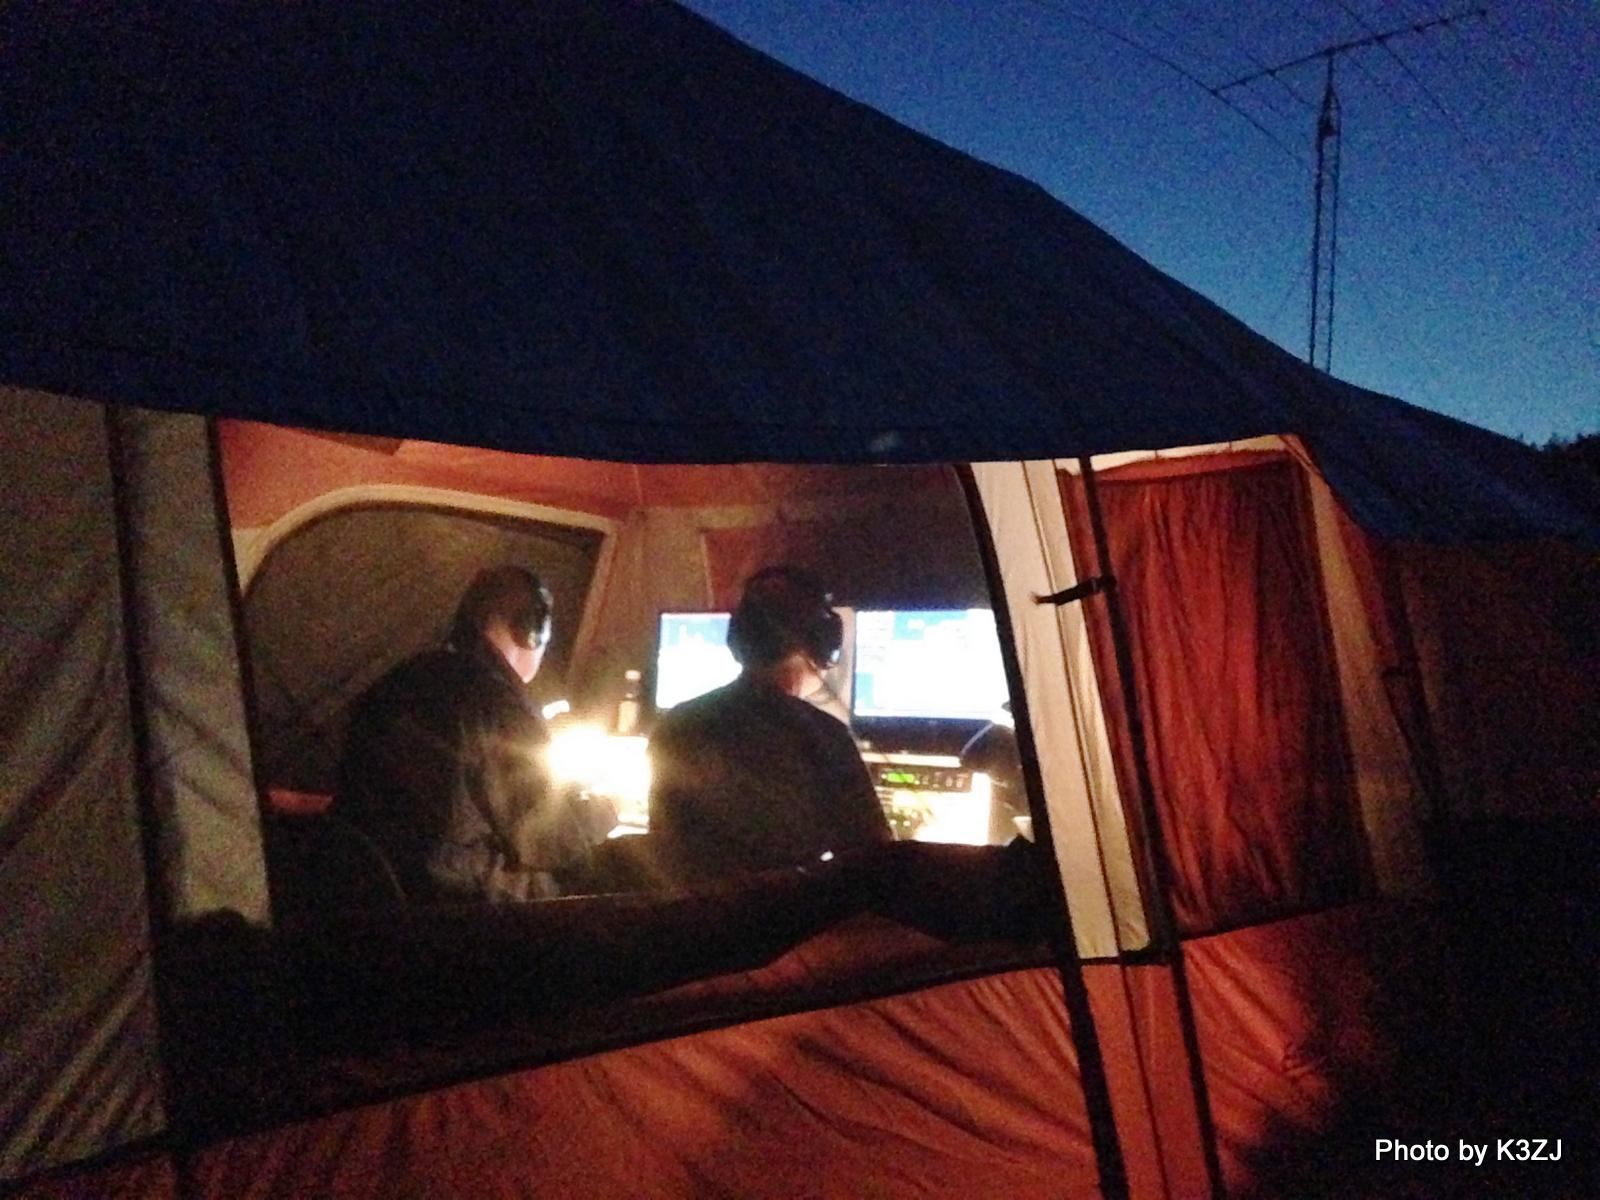 R9DX & UA9CDV Battle Into the Night 2.JPG